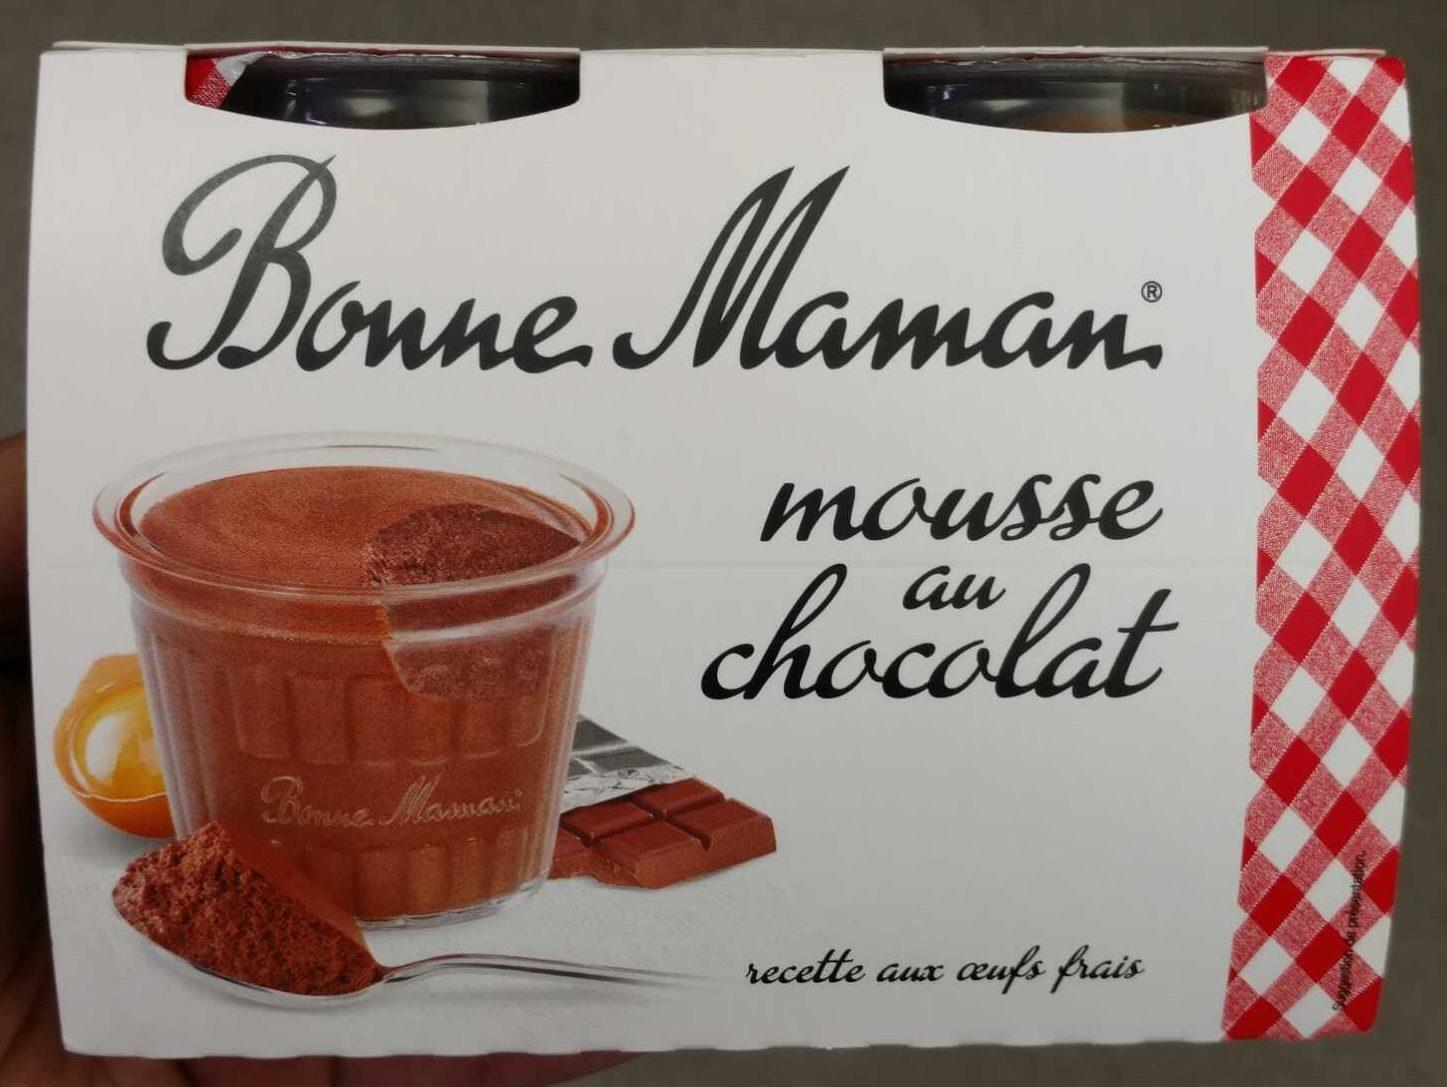 Mousse au chocolat - Product - fr